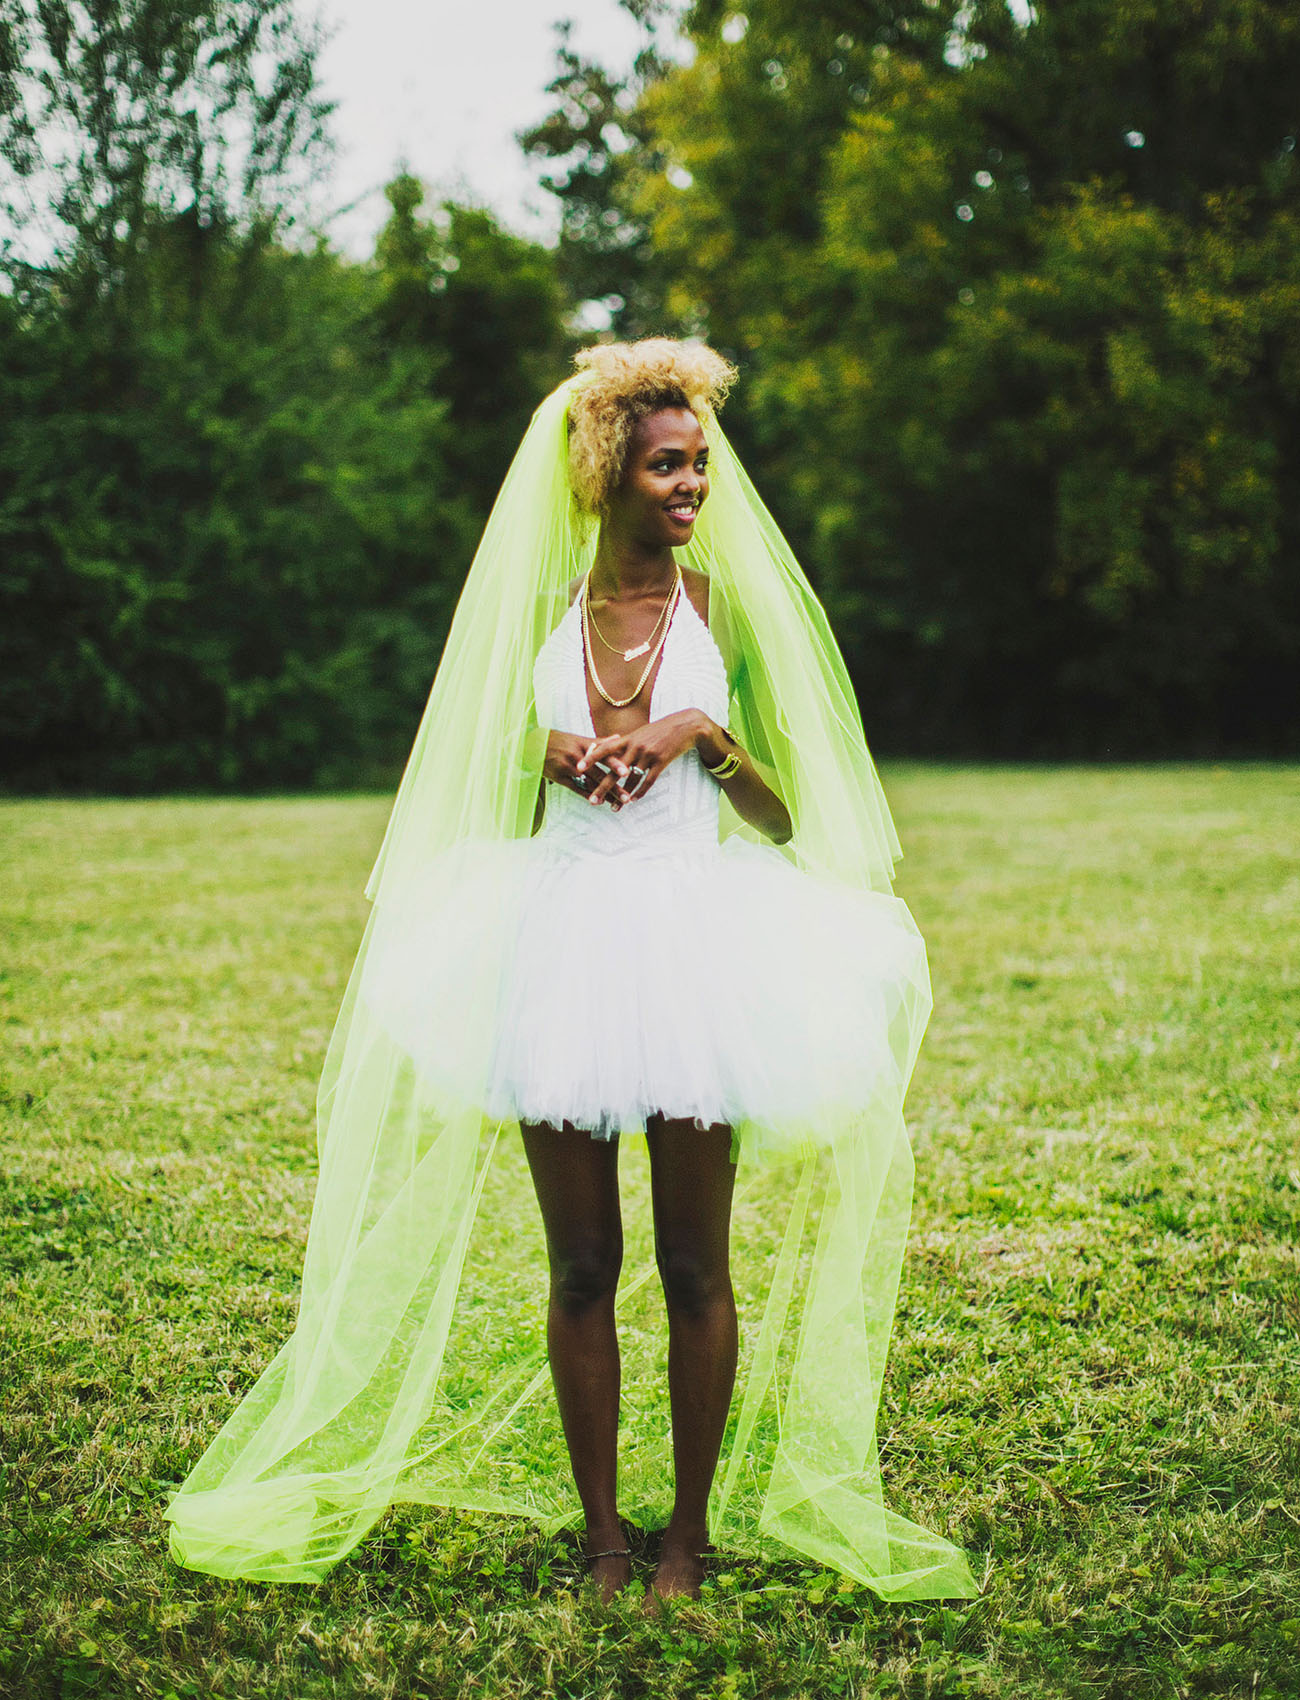 neon veil